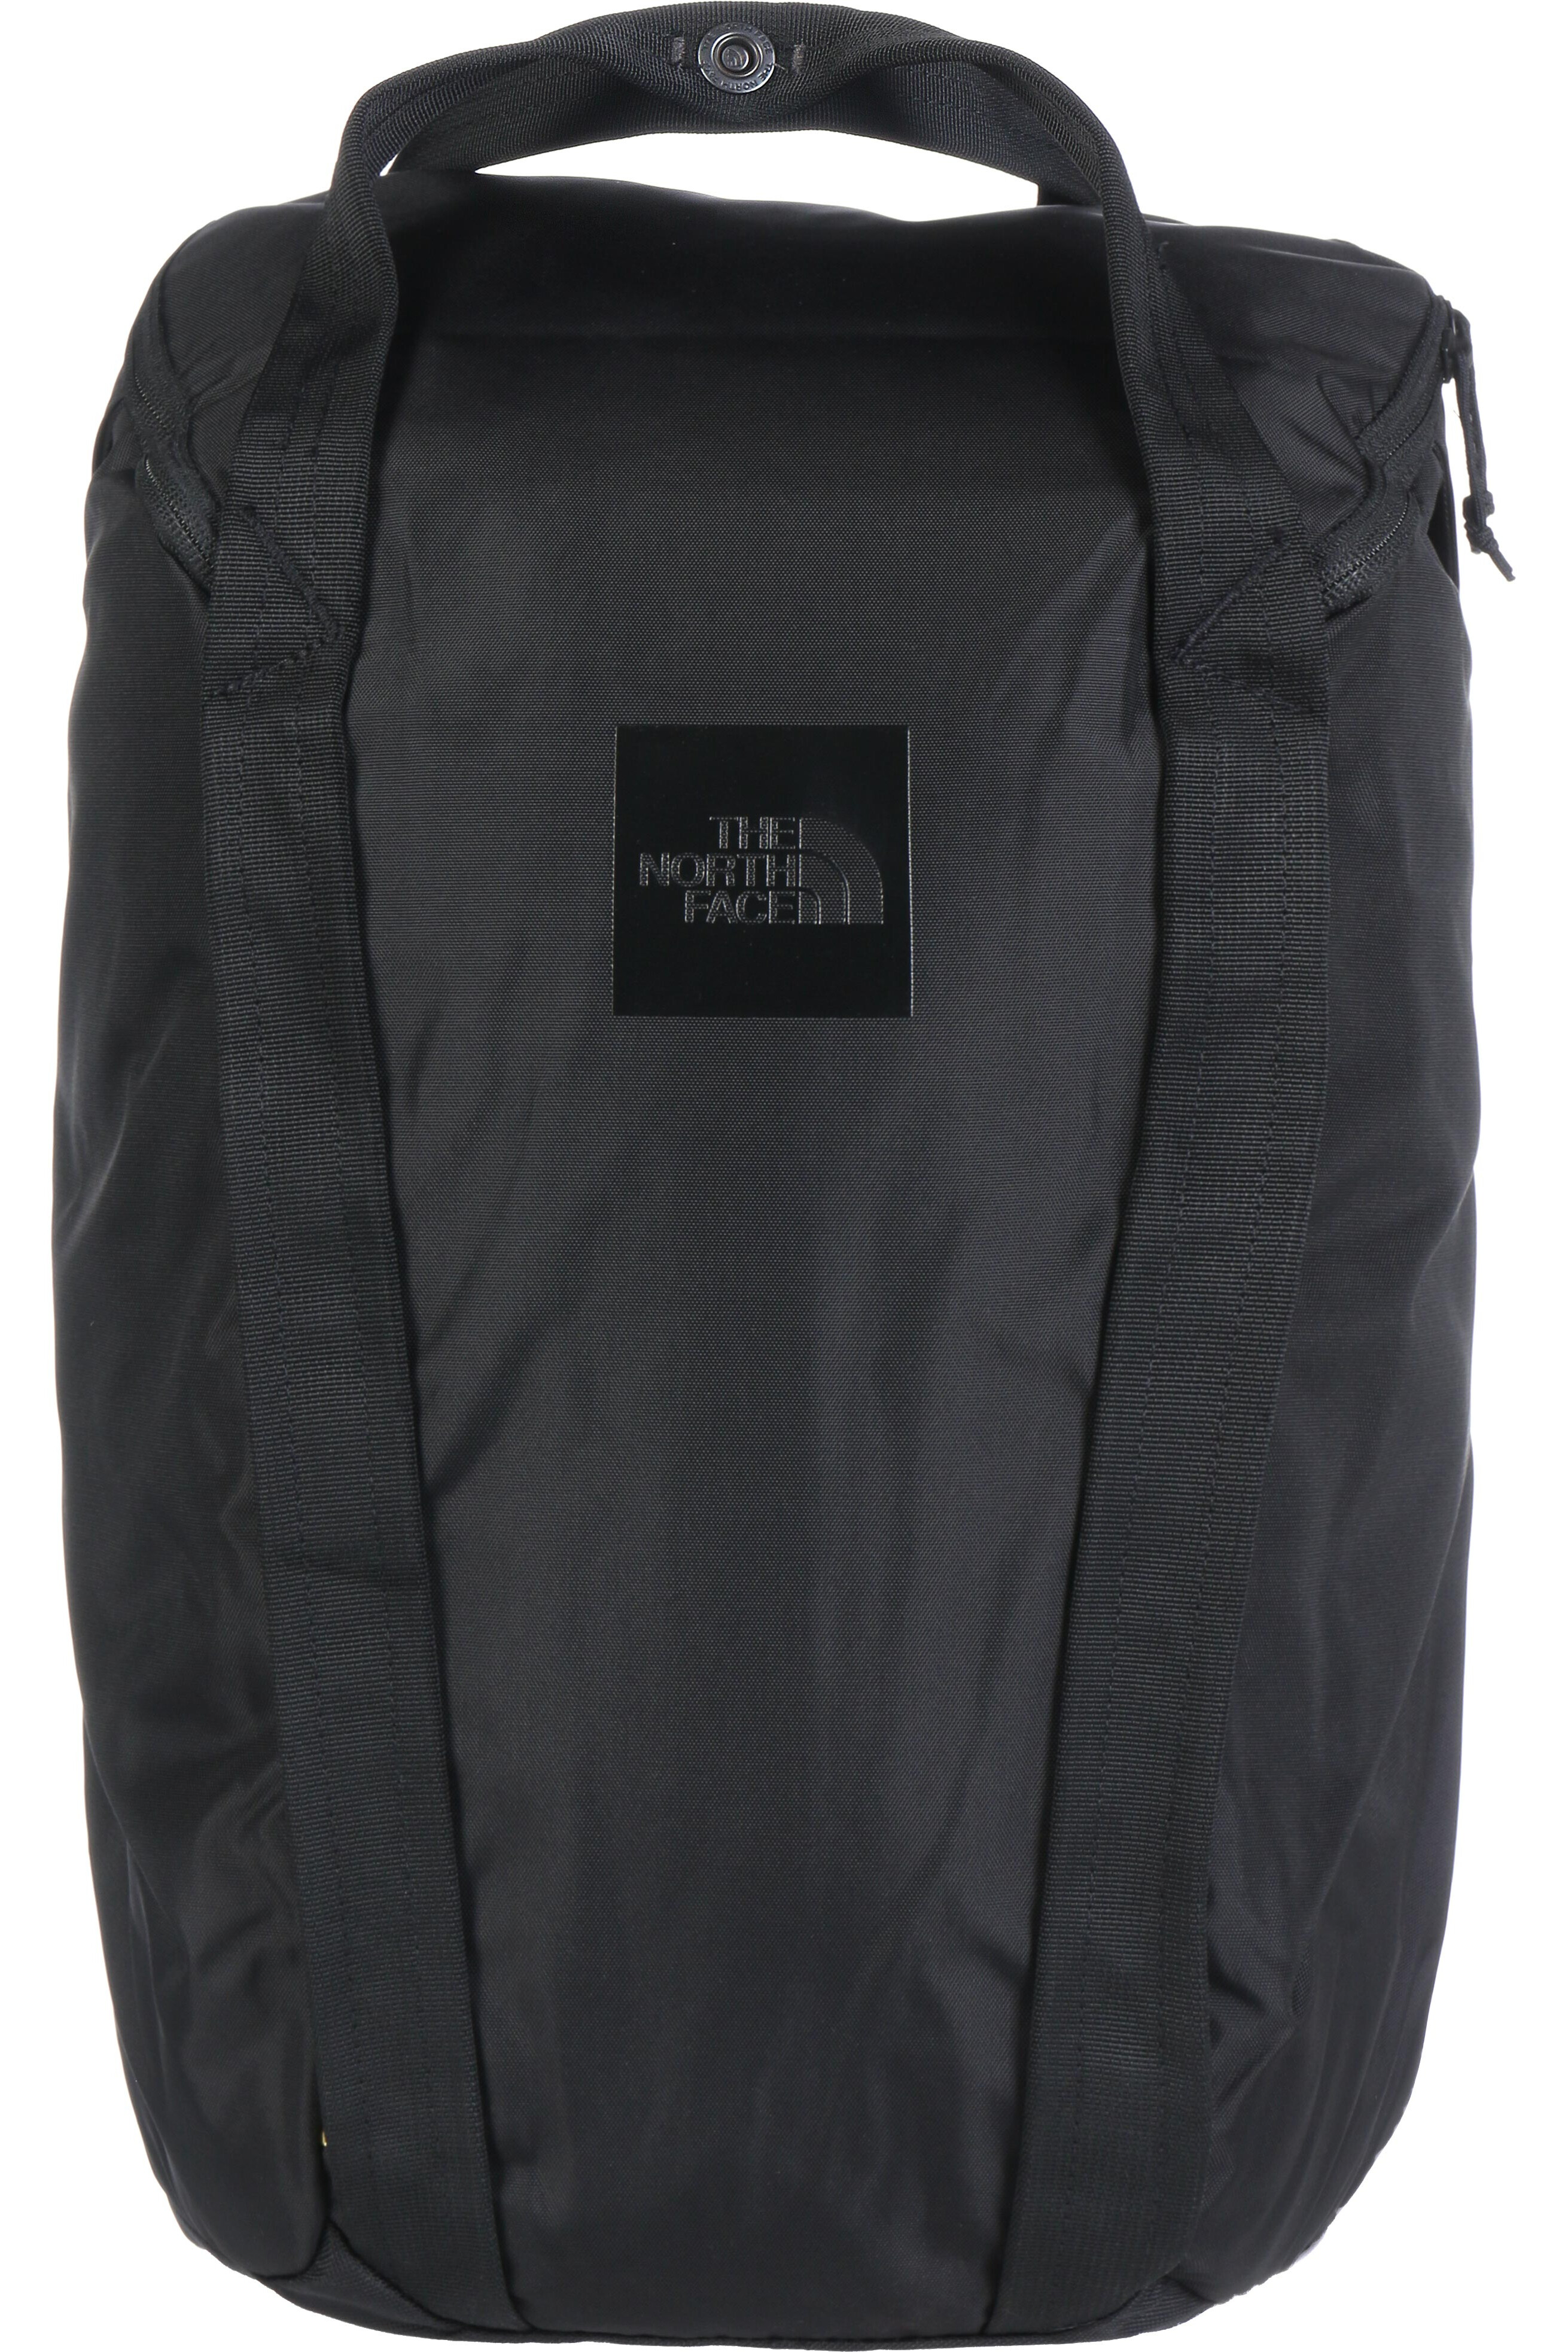 innovative design 6bef2 62689 The North Face Instigator 20 Backpack tnf black/tnf black